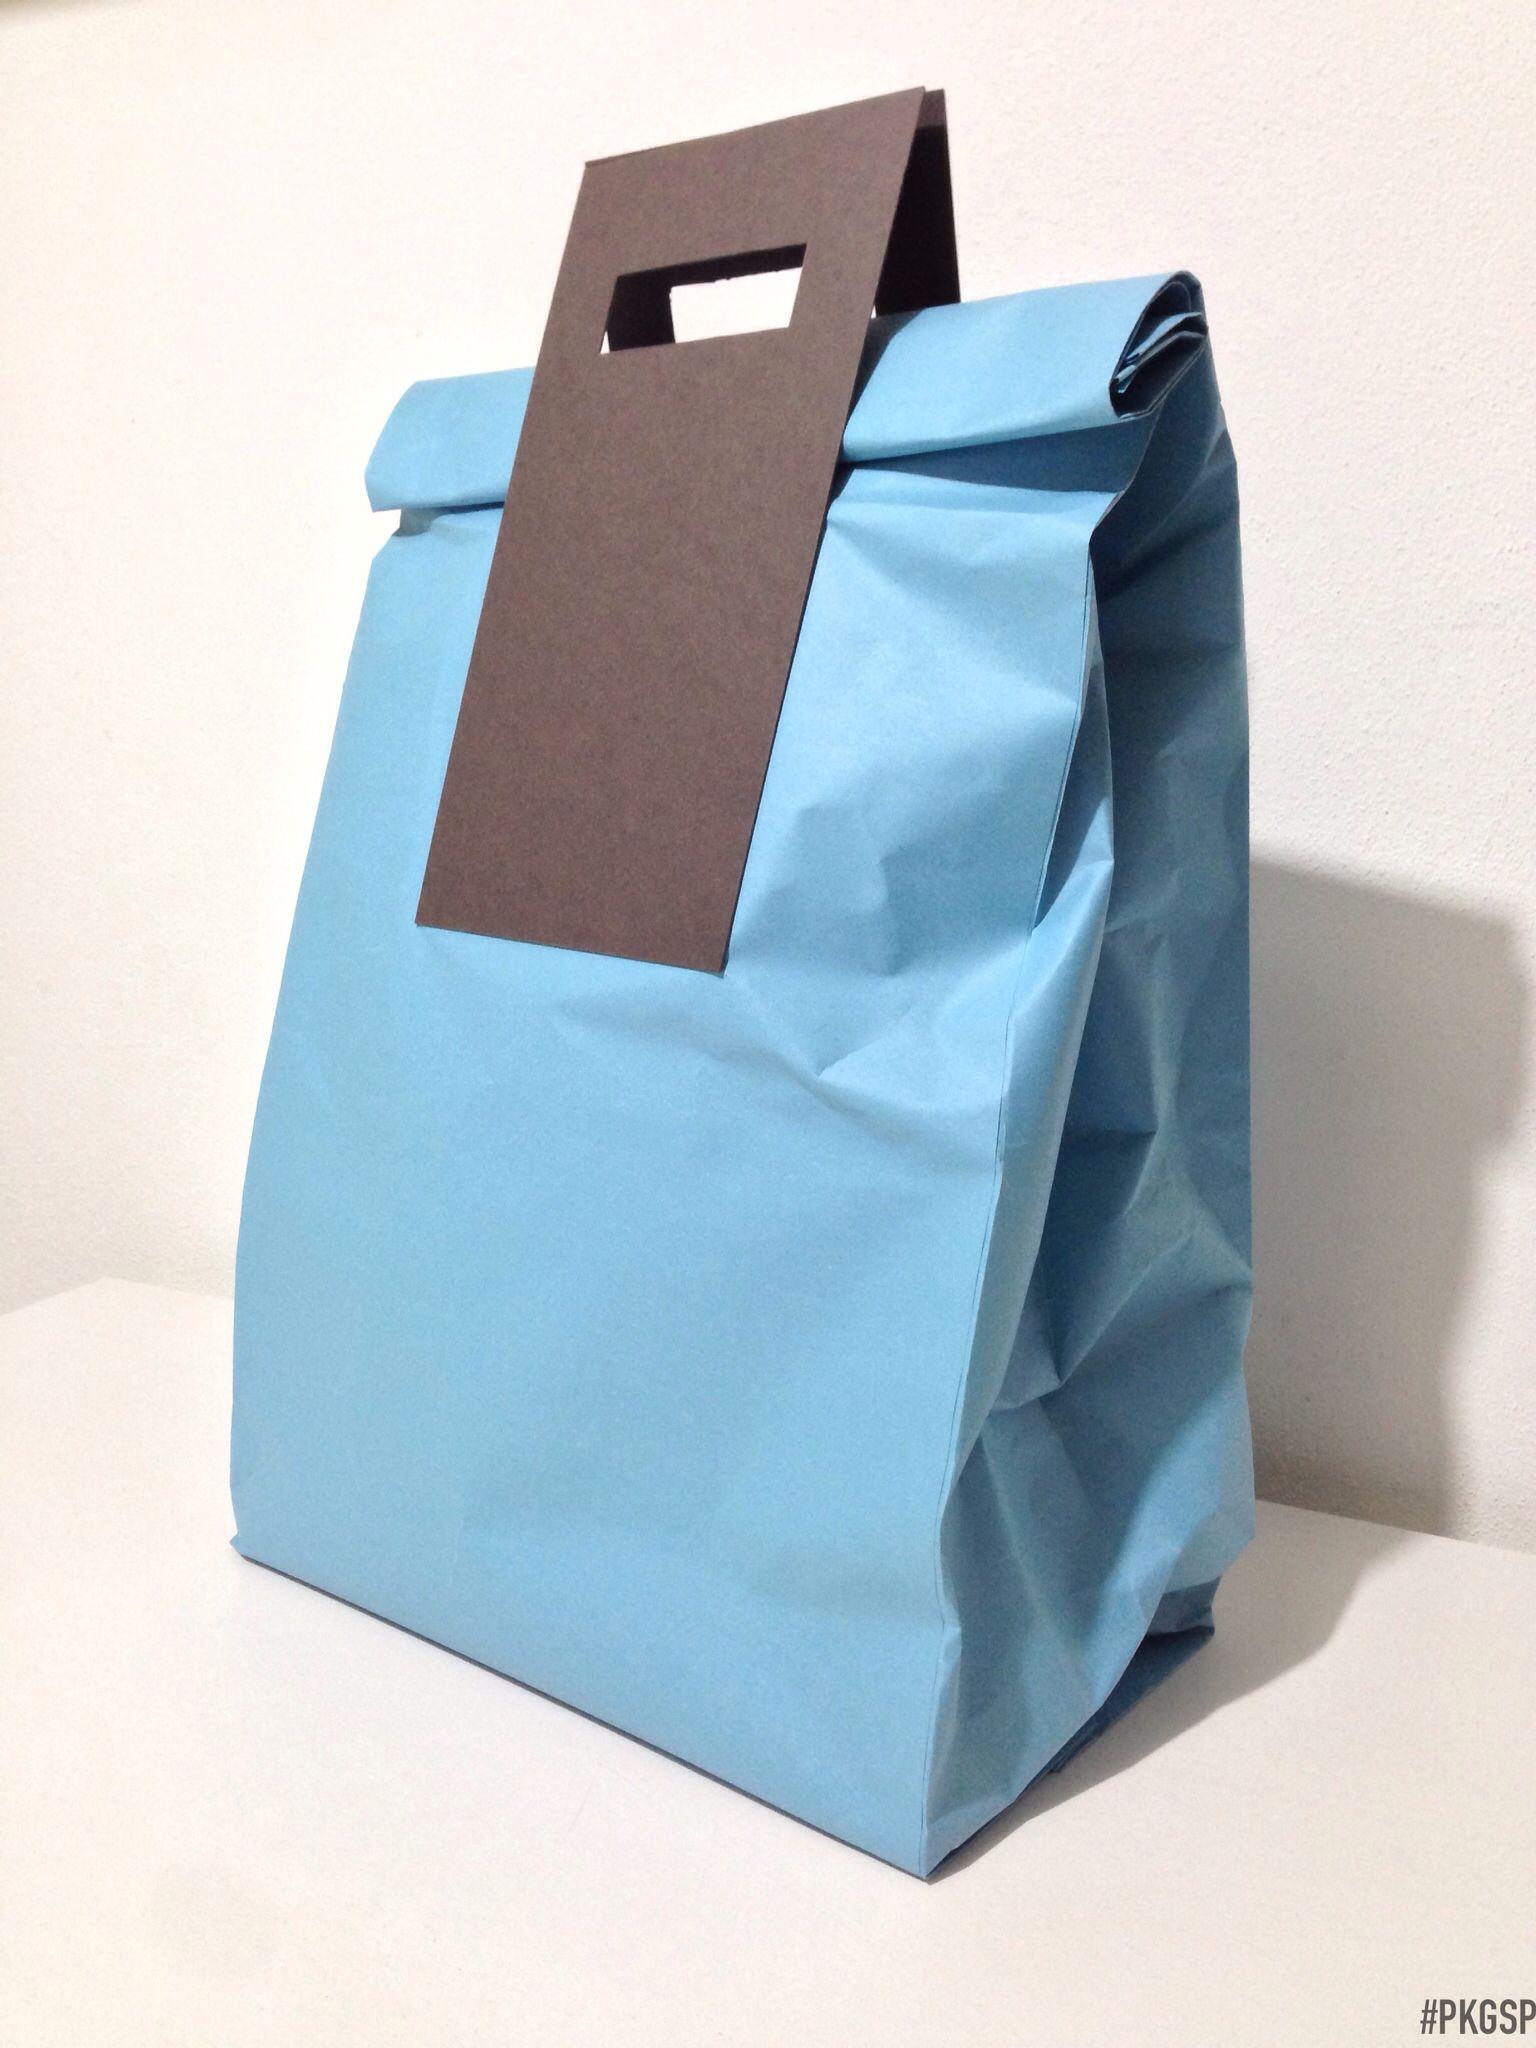 Design packaging packaging specialist packaging - Saccone Azzurro Pkgsp Packaging Specialist Please Visit Our Blog Packagingspecialist